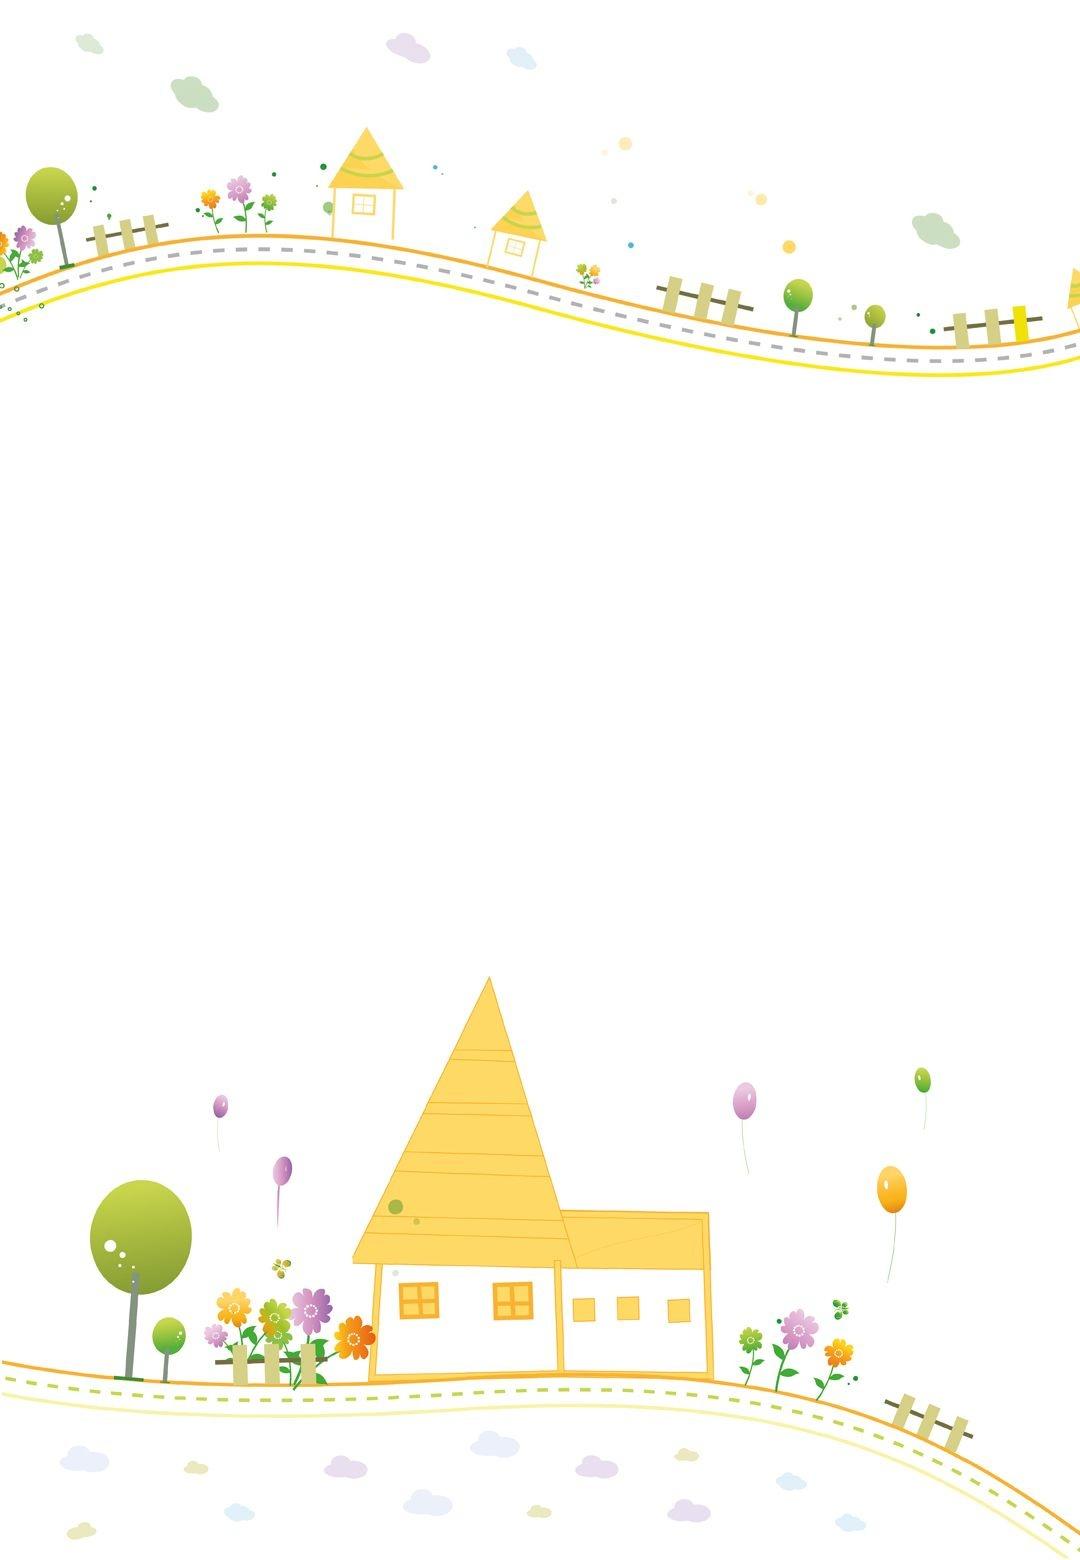 Housewarming Party - Free Printable Housewarming Invitation Template - Free Printable Housewarming Invitations Cards